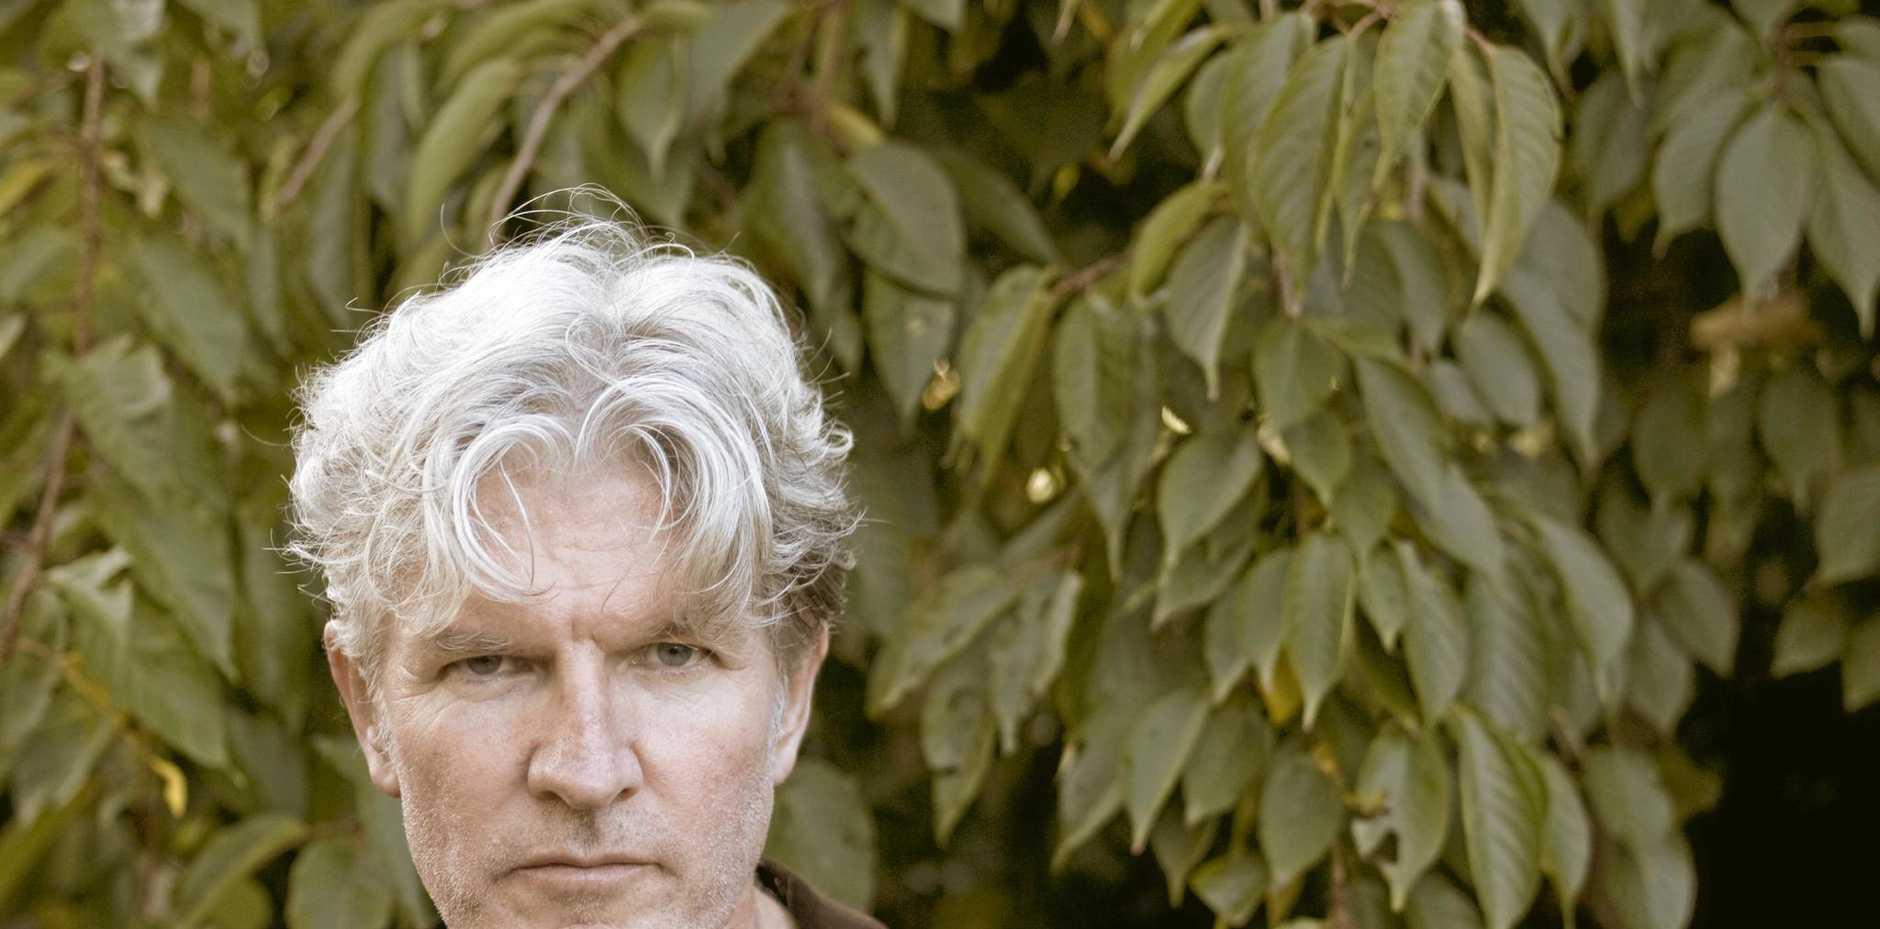 Music veteran Tim Finn from New Zealand will headline the Airlie Beach Music Festival.